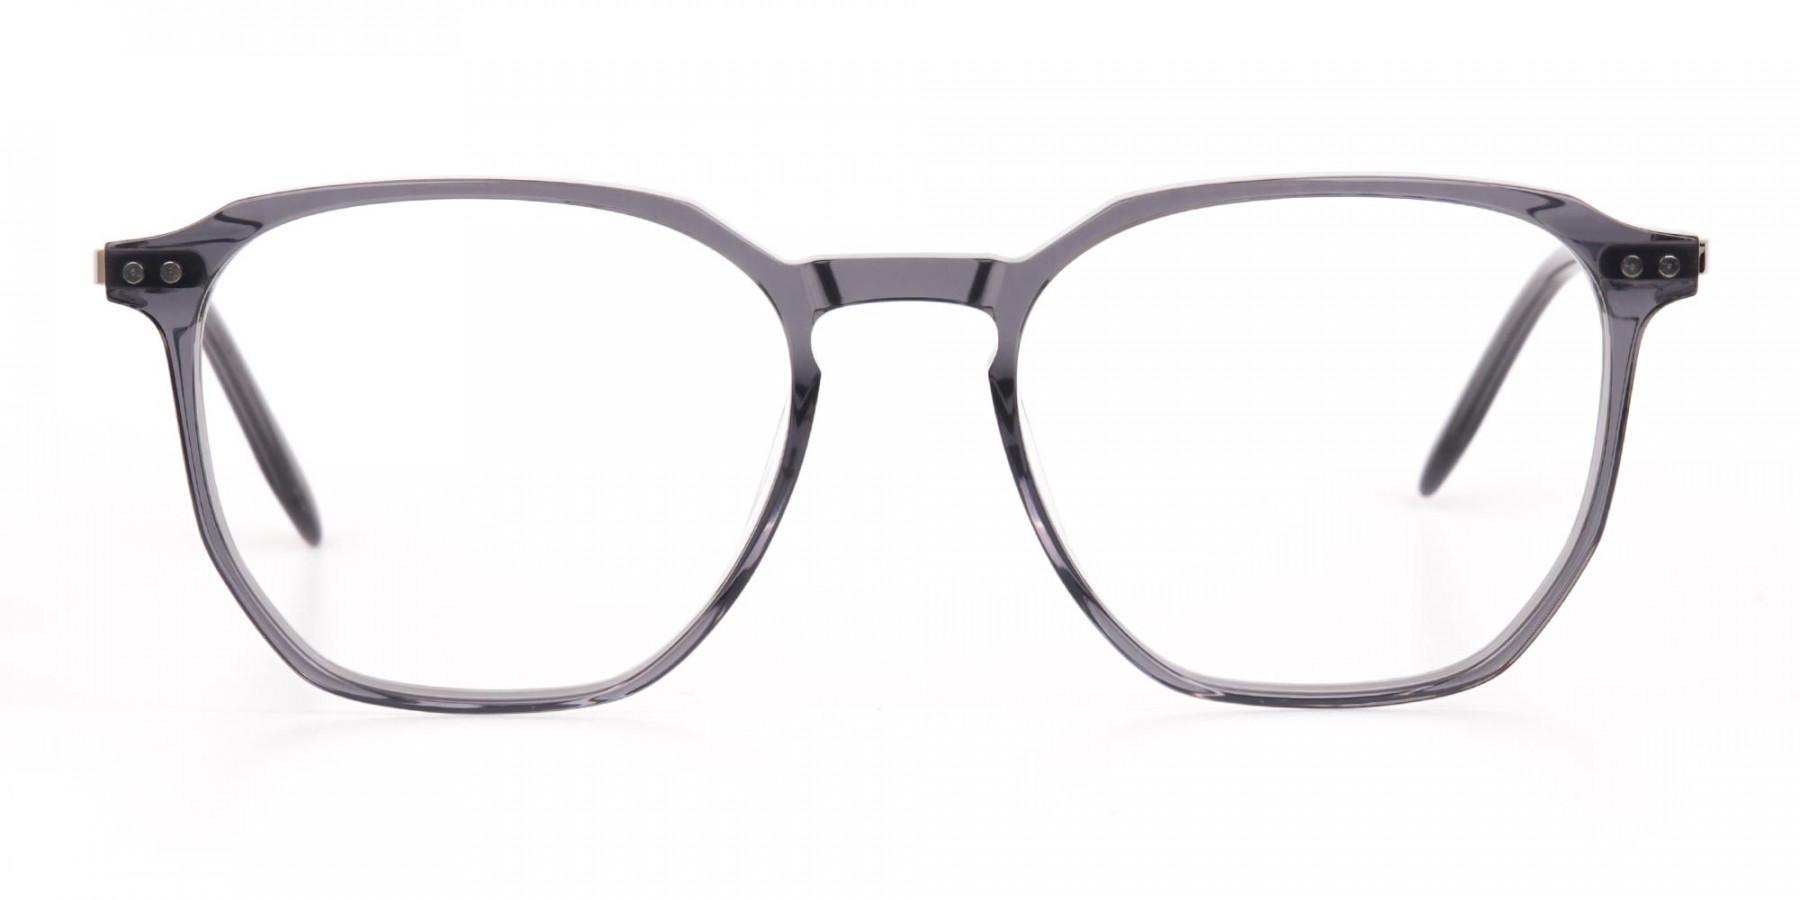 Silver Grey Geometric Eyeglasses Frame Unisex-1